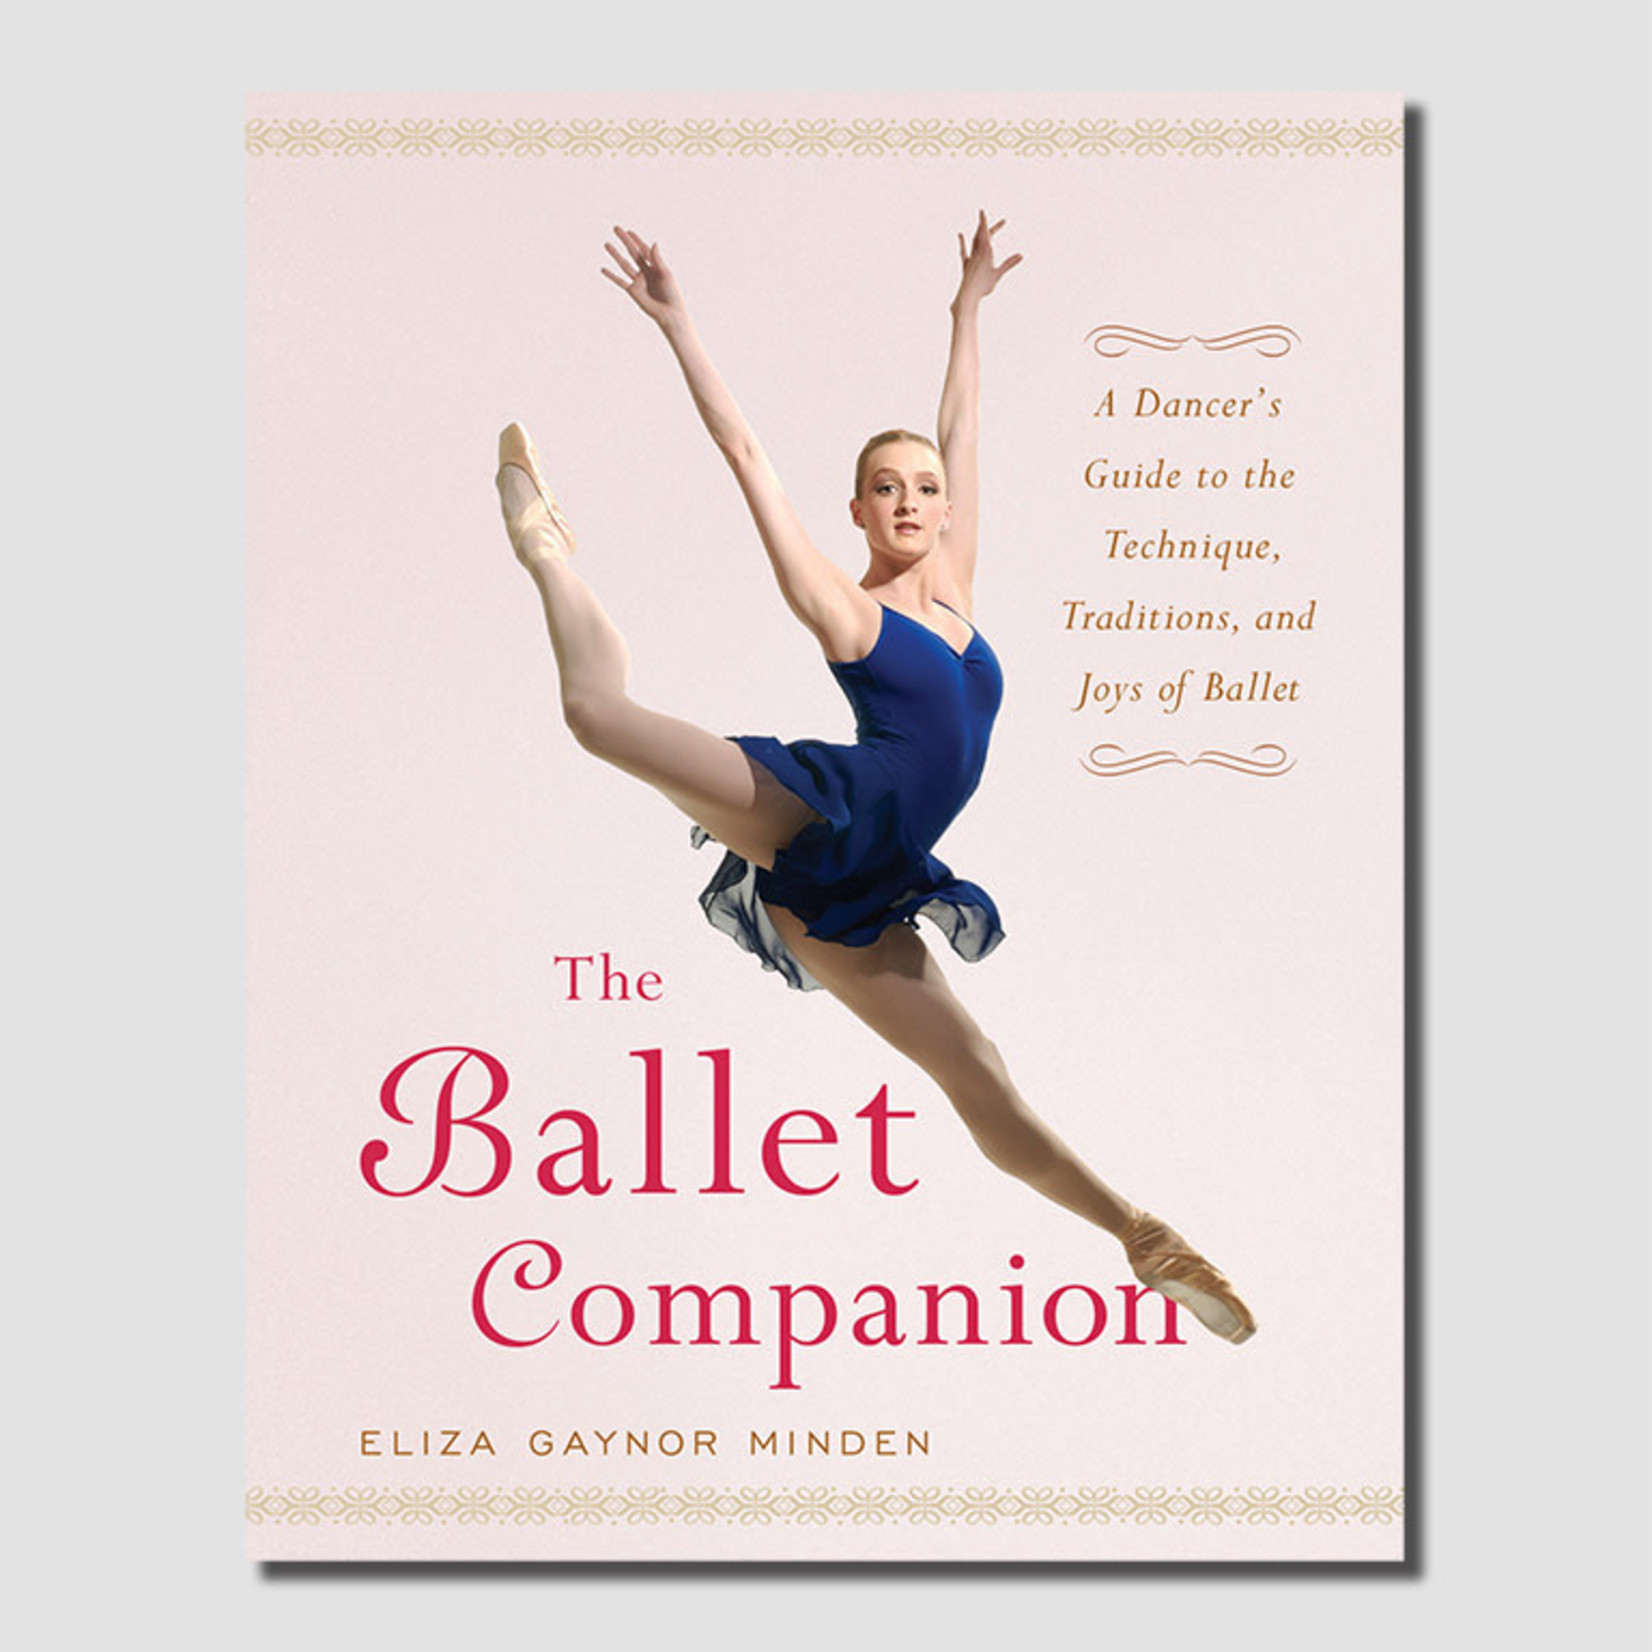 Gaynor Minden The Ballet Companion Book by Eliza Gaynor Minden